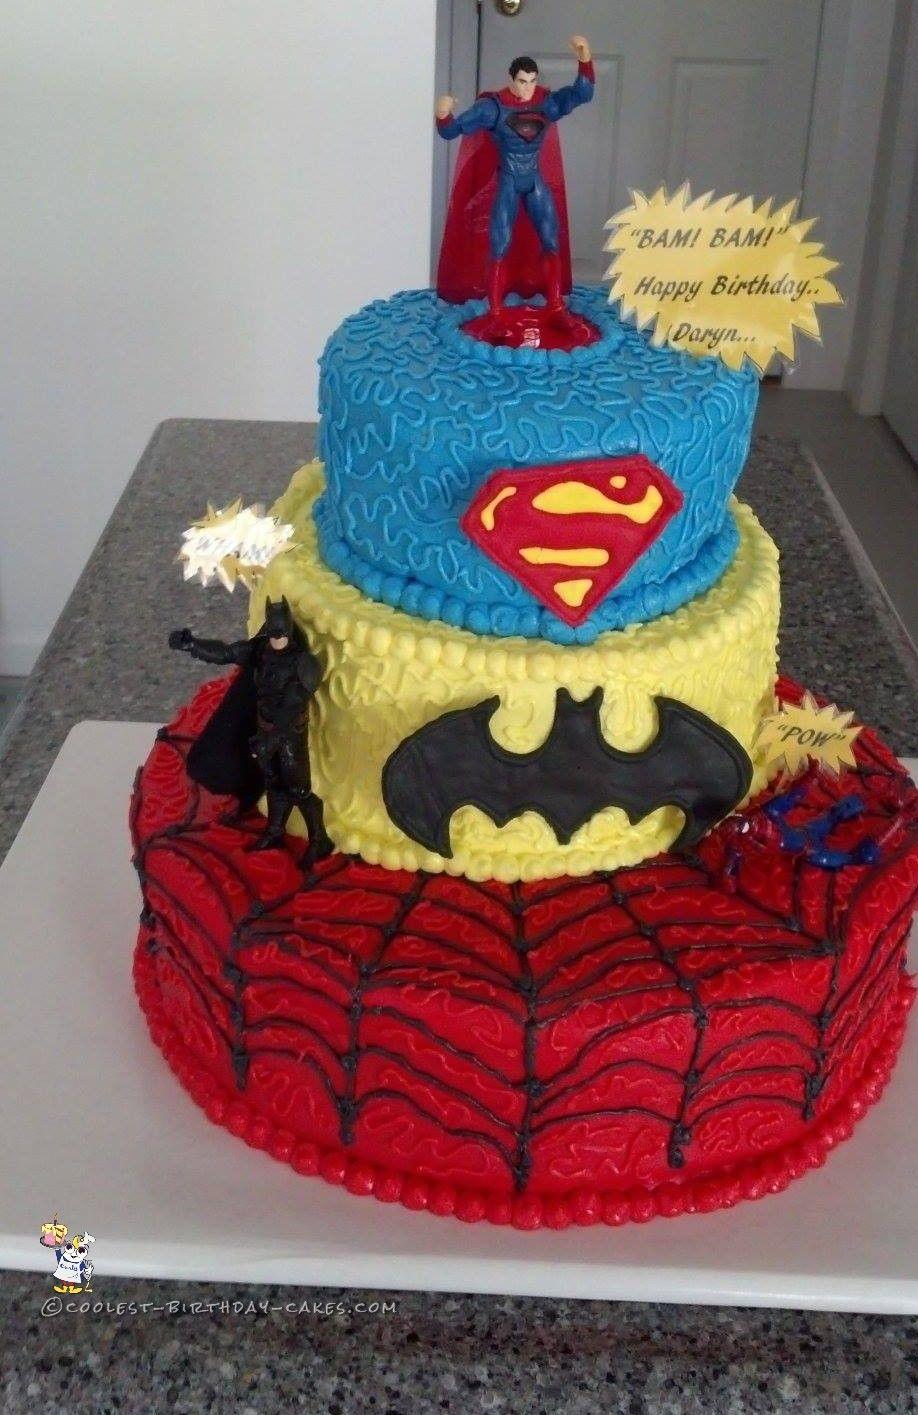 Cool 3 Tier Superhero Birthday Cake Coolest Birthday Cakes